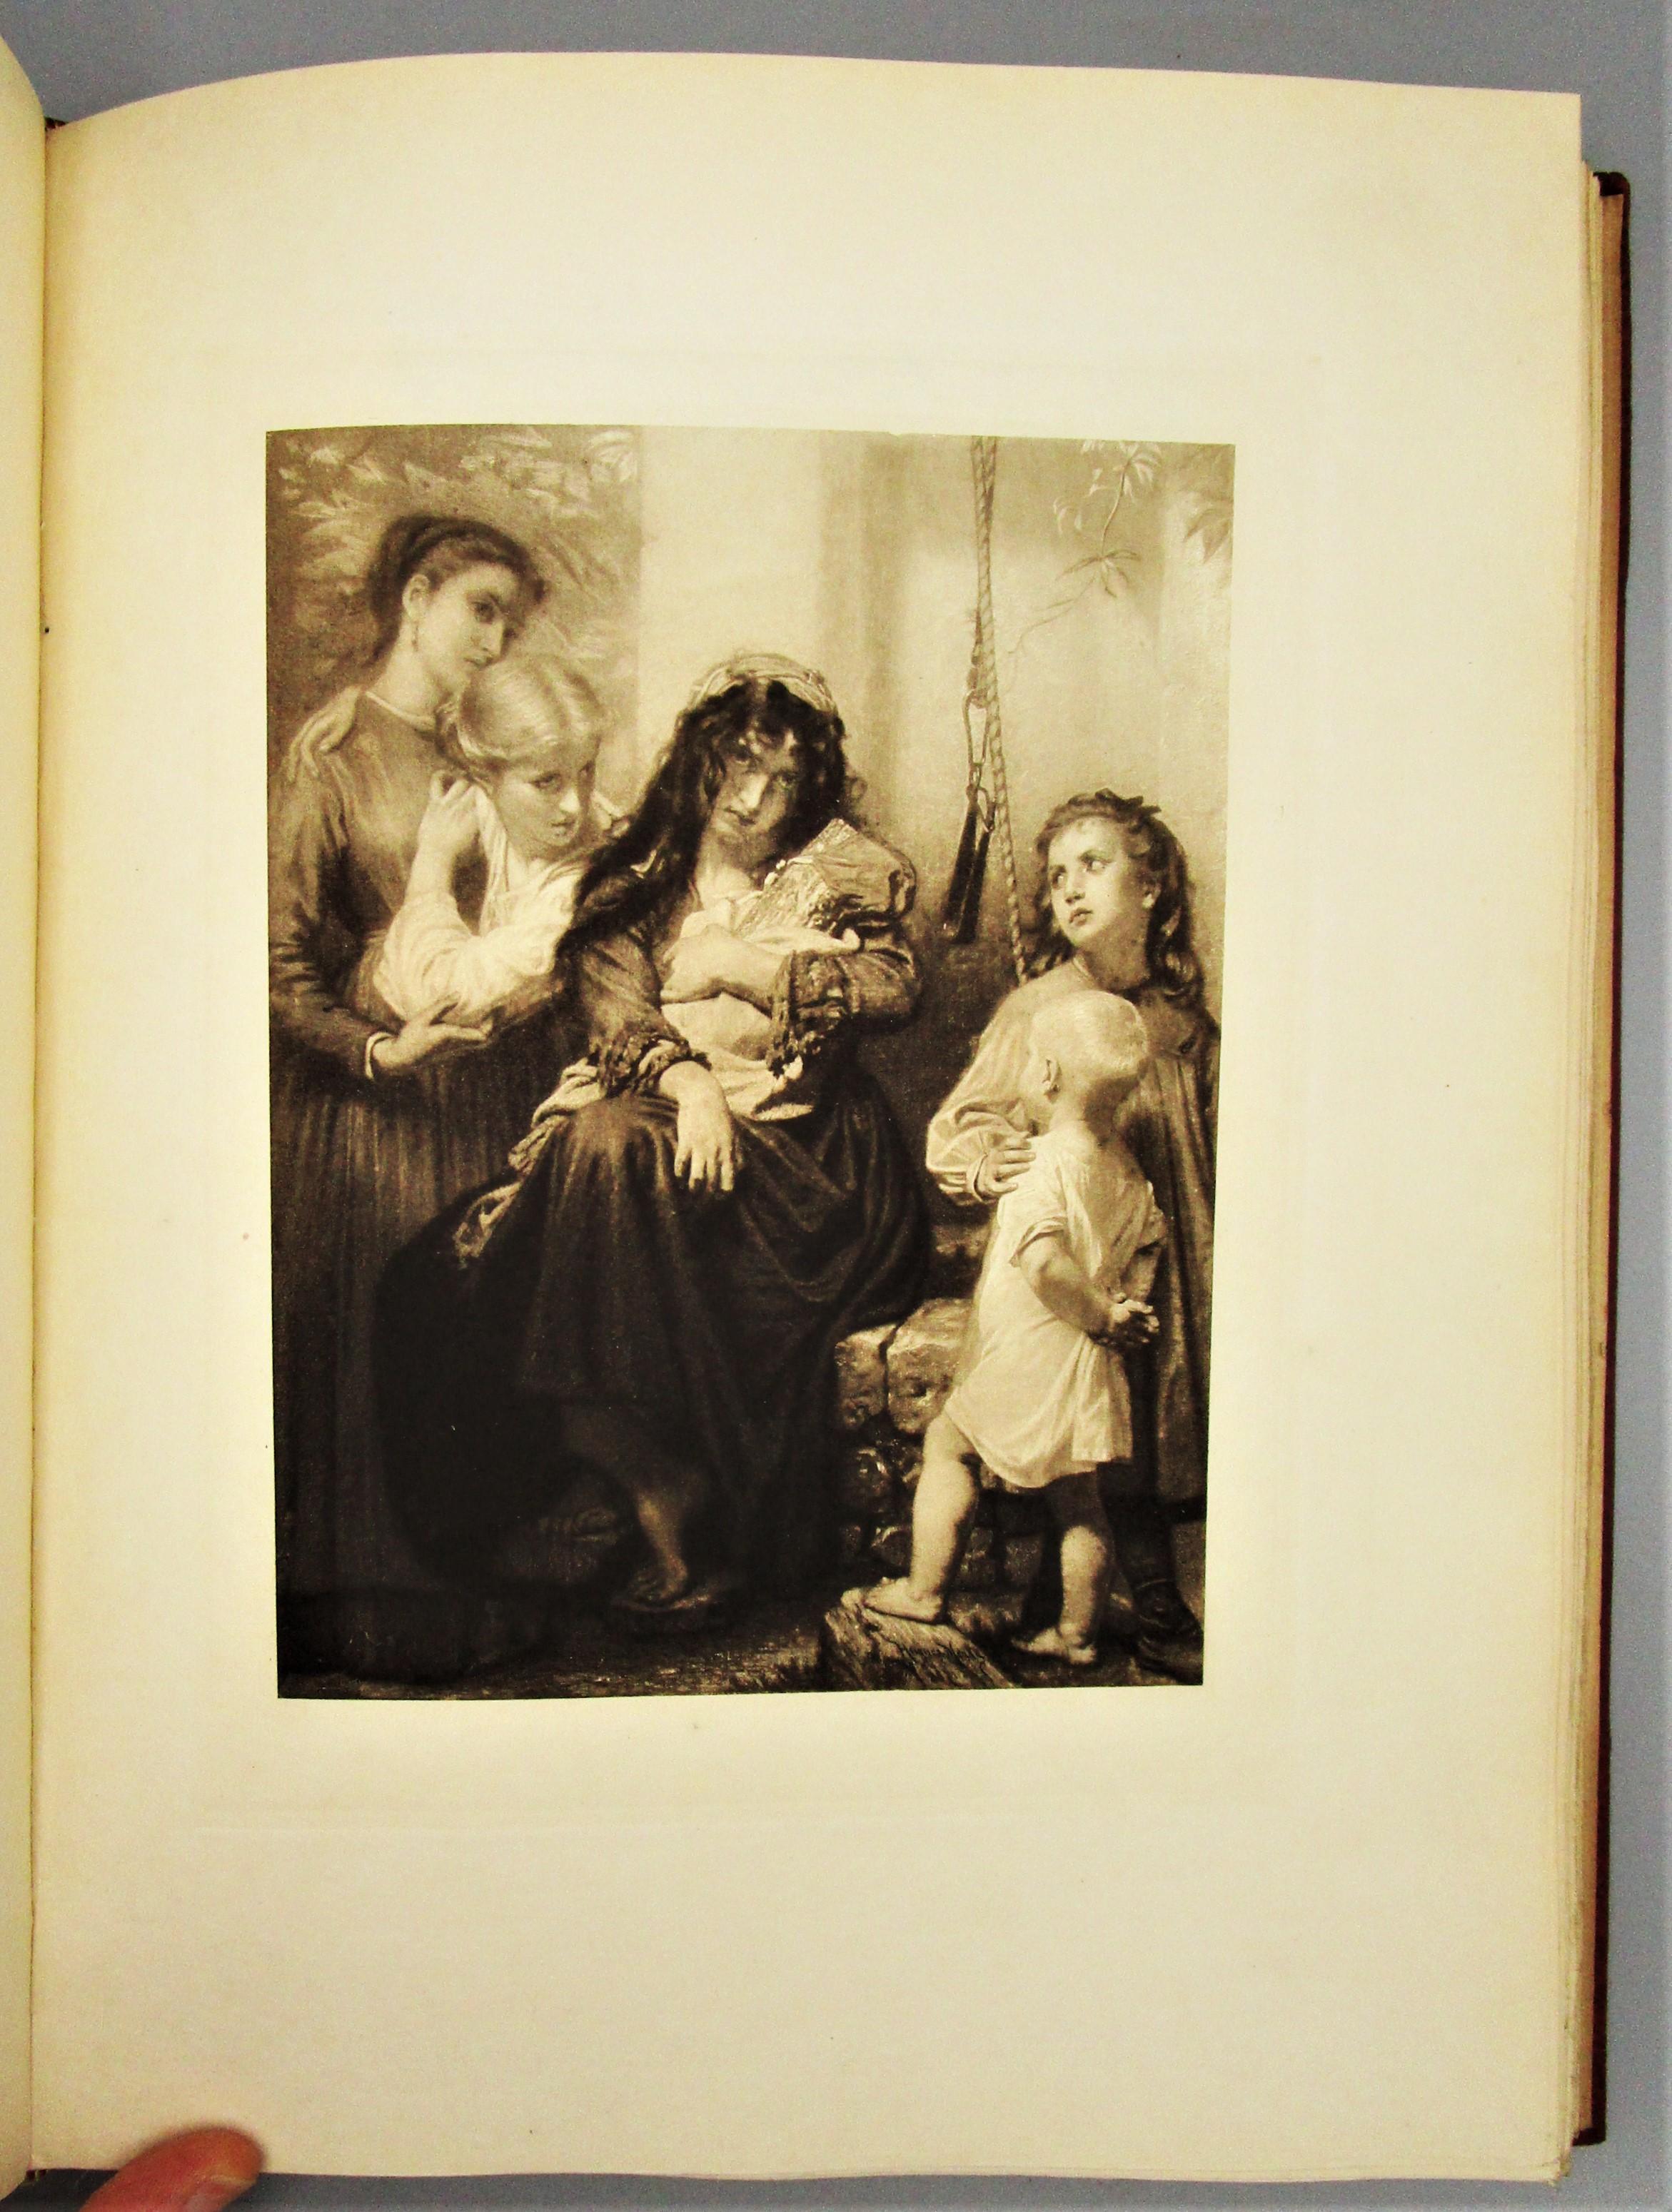 THE VALUABLE ART COLLECTION OF JOHN T. MARTIN - 1909 [Ltd Ed]